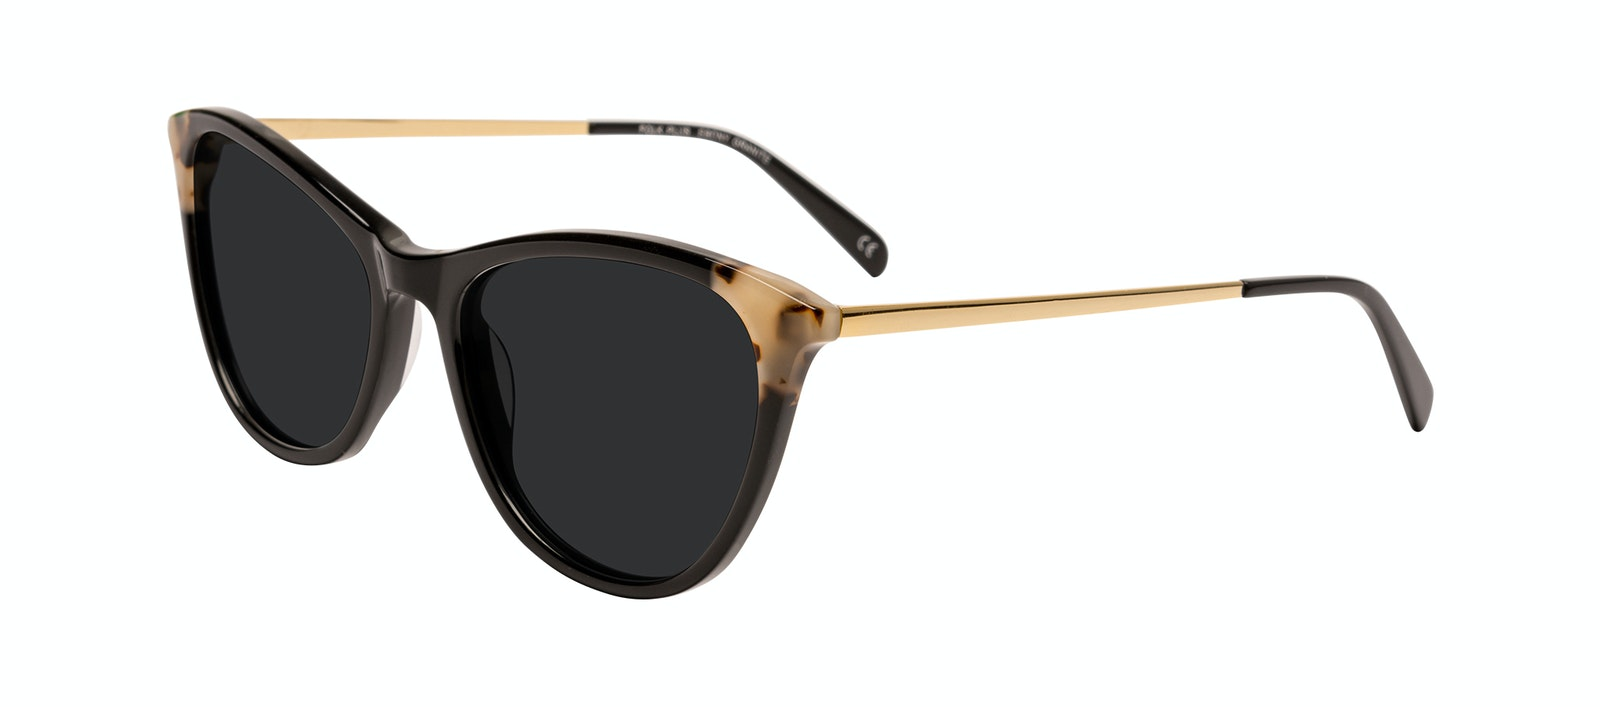 Affordable Fashion Glasses Round Sunglasses Women Imagine II Plus Ebony Granite Tilt